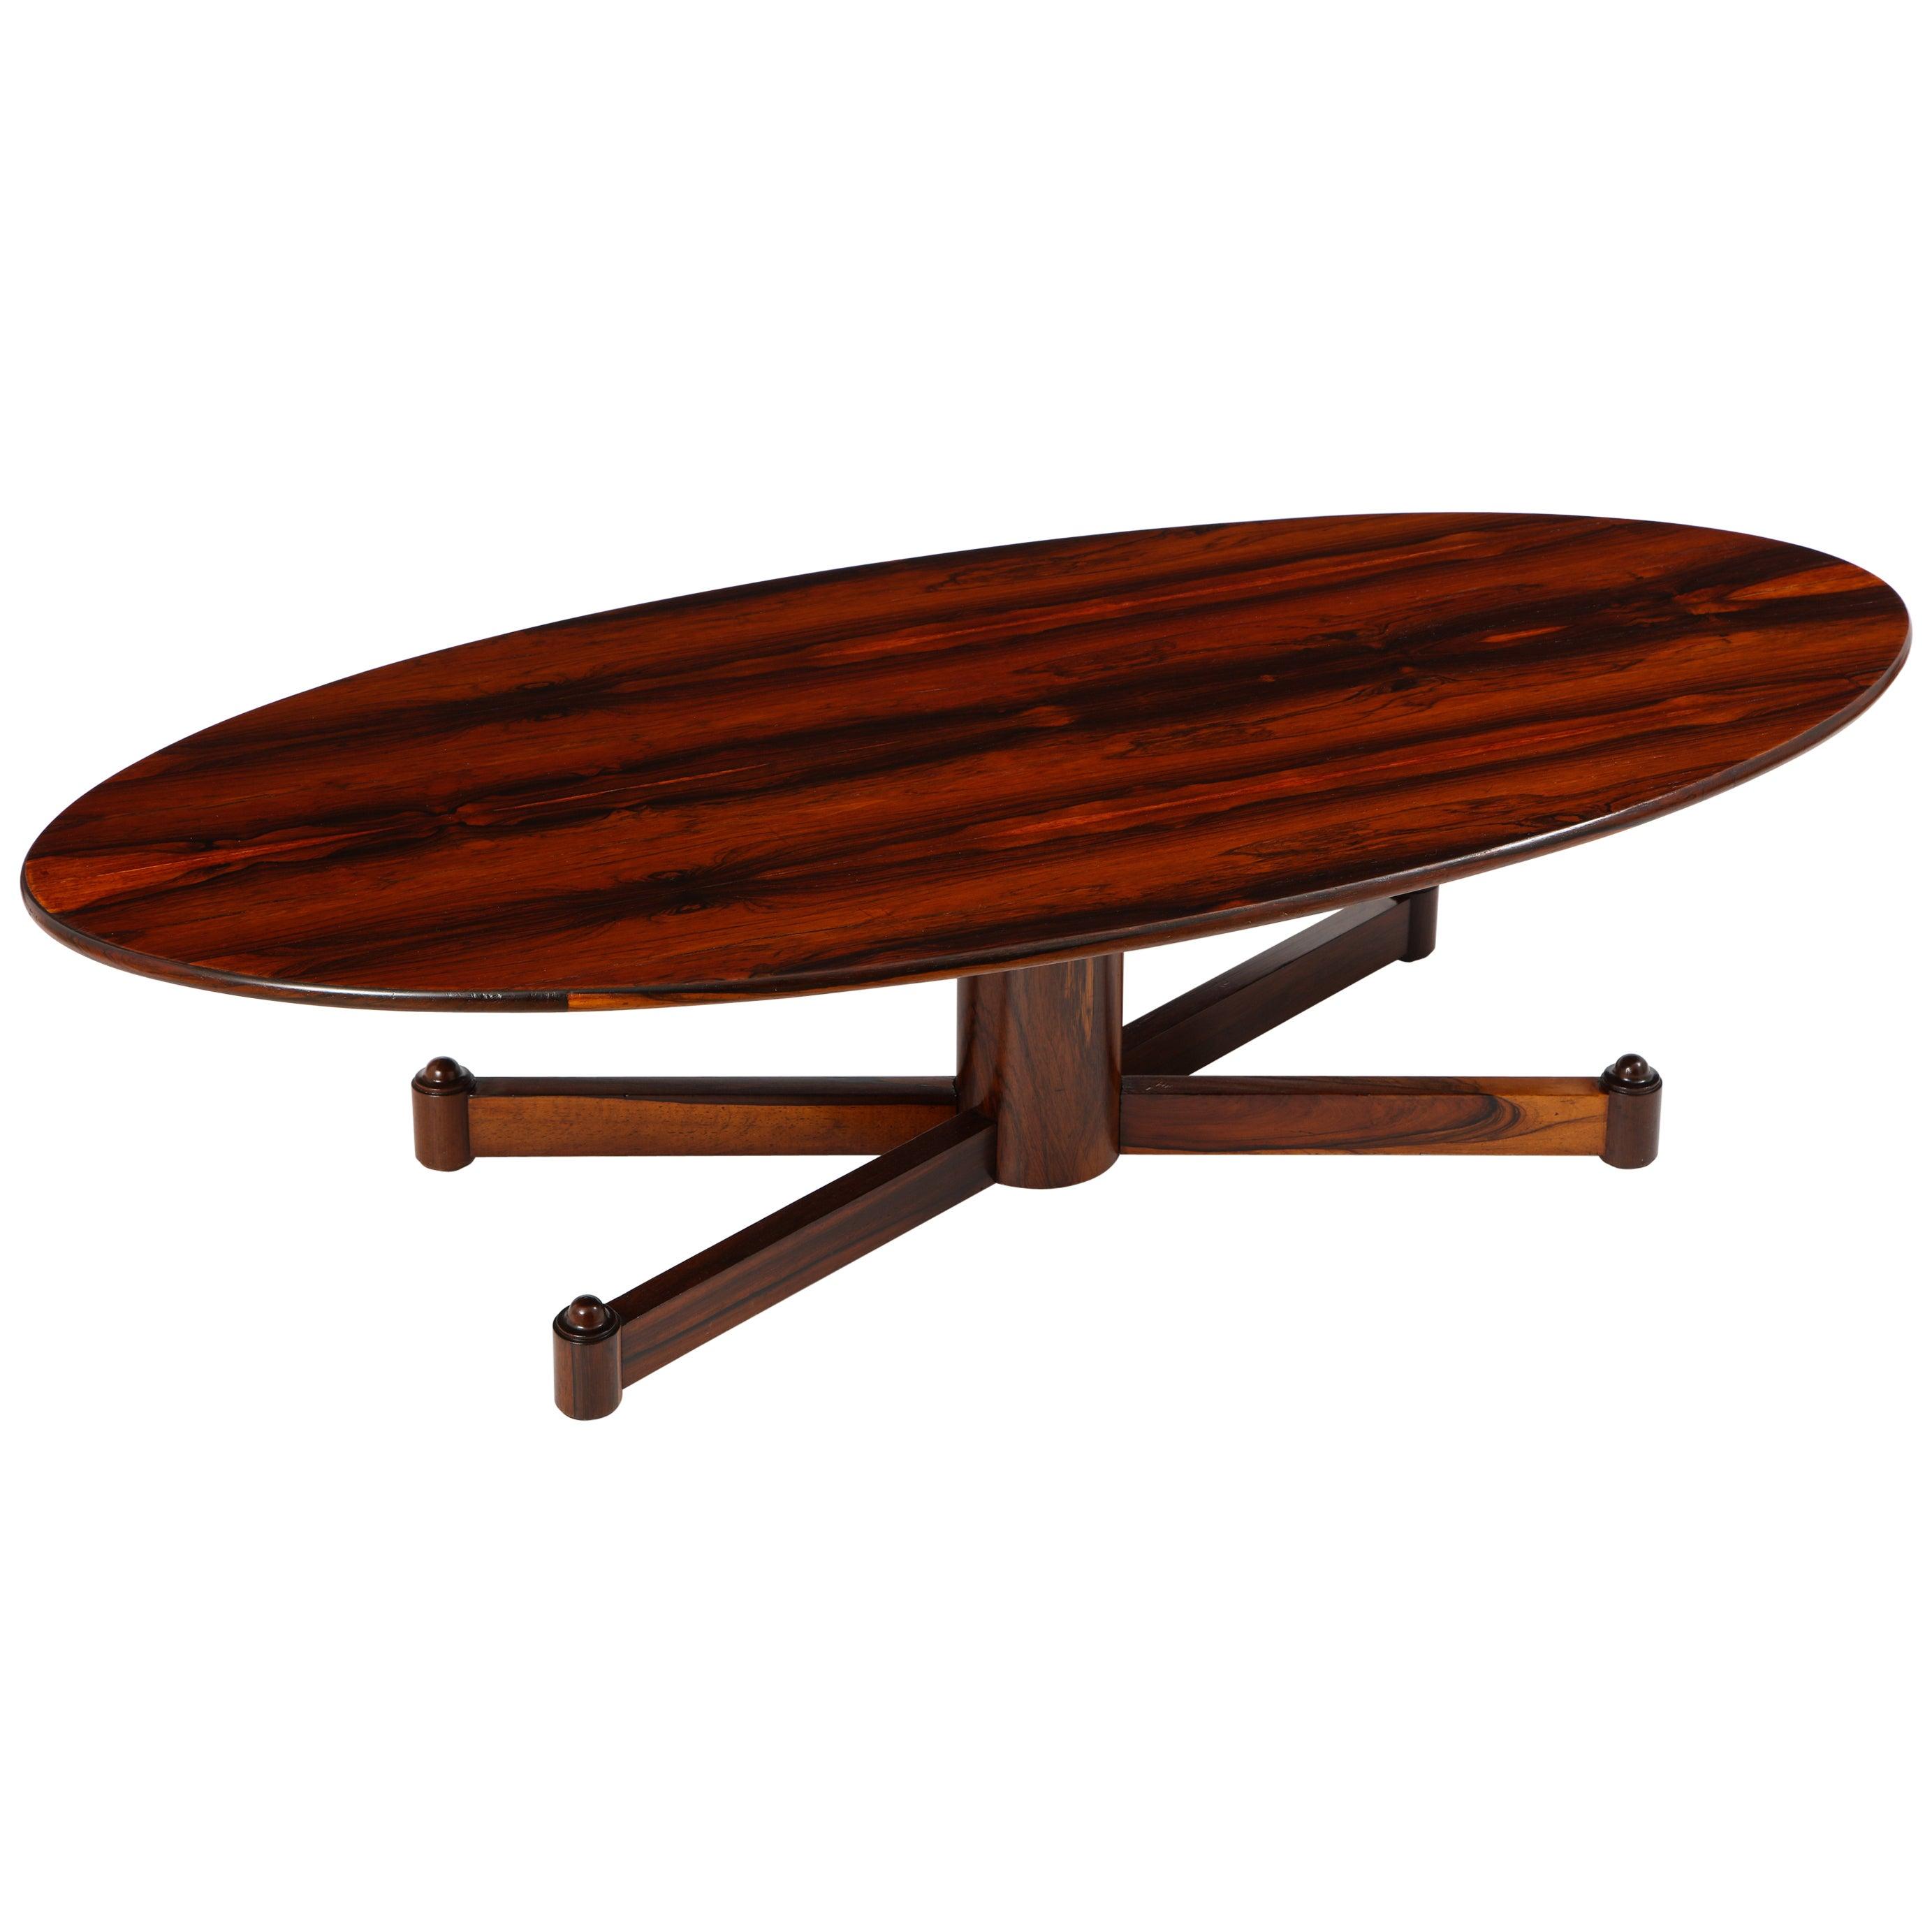 Brazilian Mid-Century Modern Wood Oval Coffee Table, Brazil 1950s